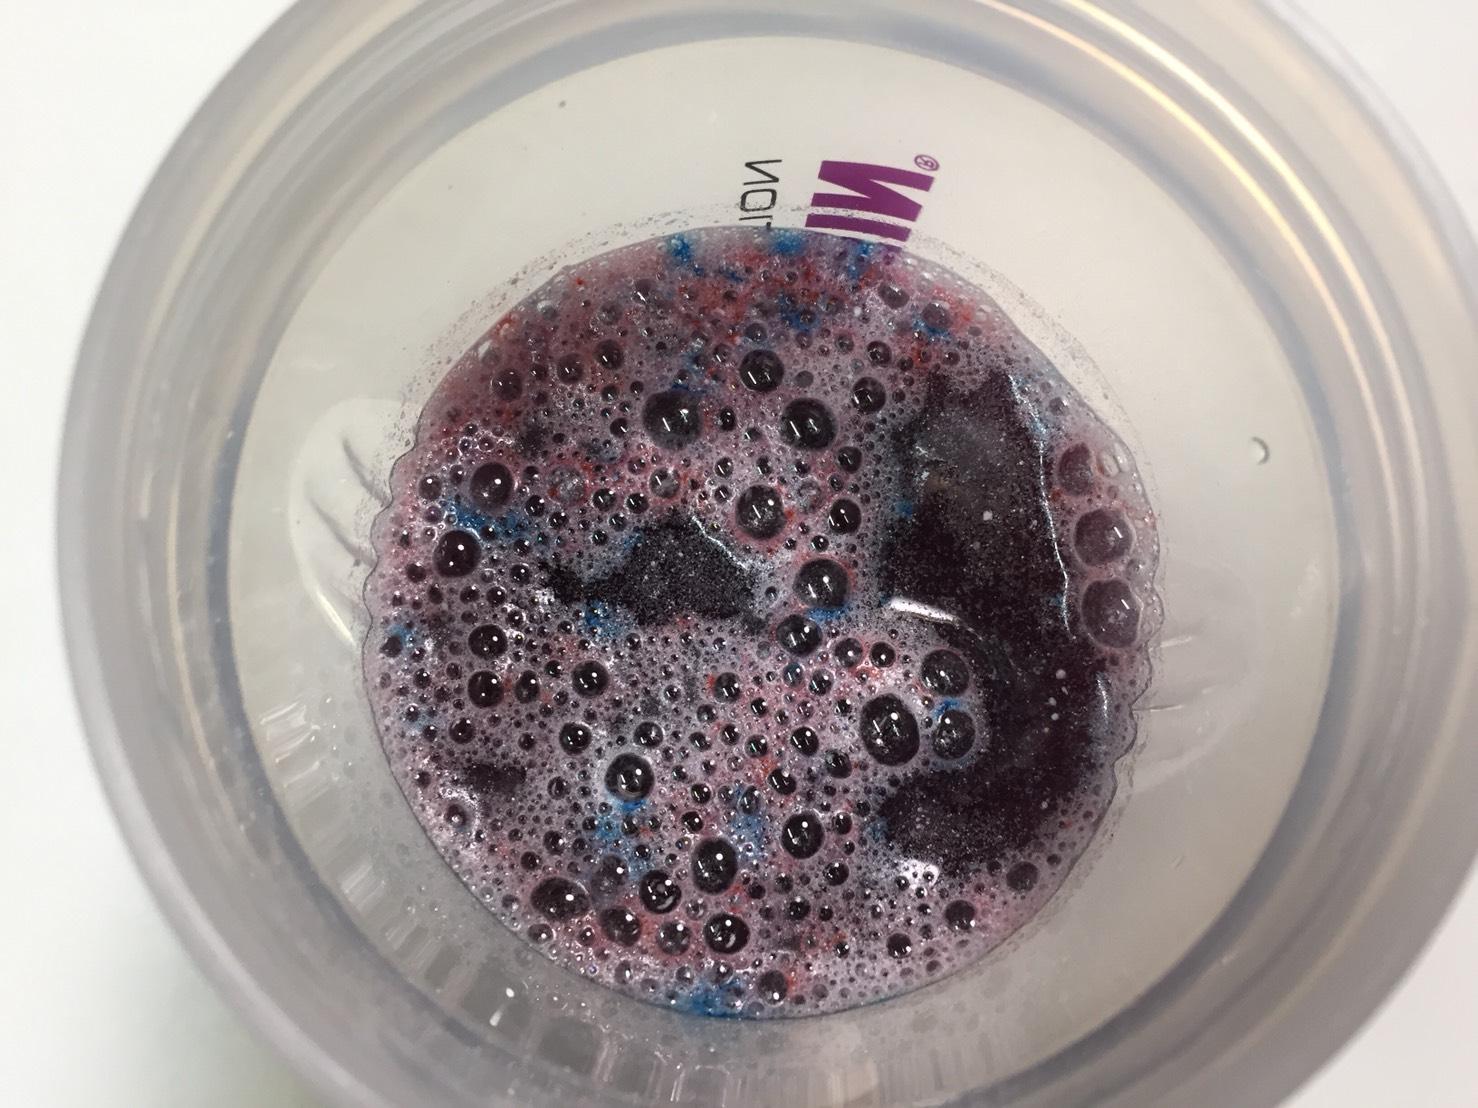 MYPRE(マイプレ)「Raspberry Lemonade Flavour(ラズベリーレモネード味)」に水を注いだ直後の様子